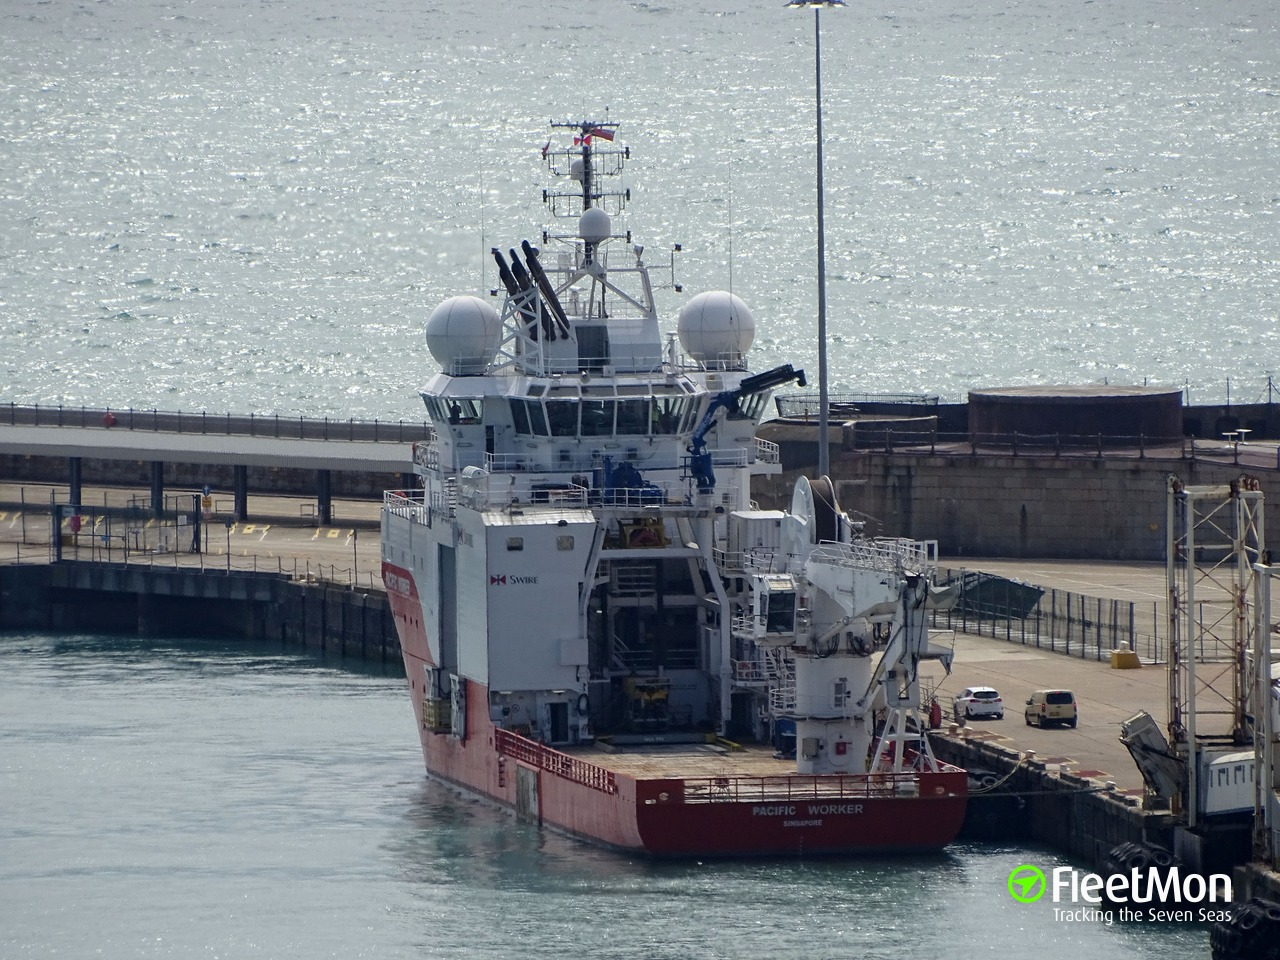 La nave NG Worker coprata dal gruppo Marnavi Next Geosolution (ph FleetMom).